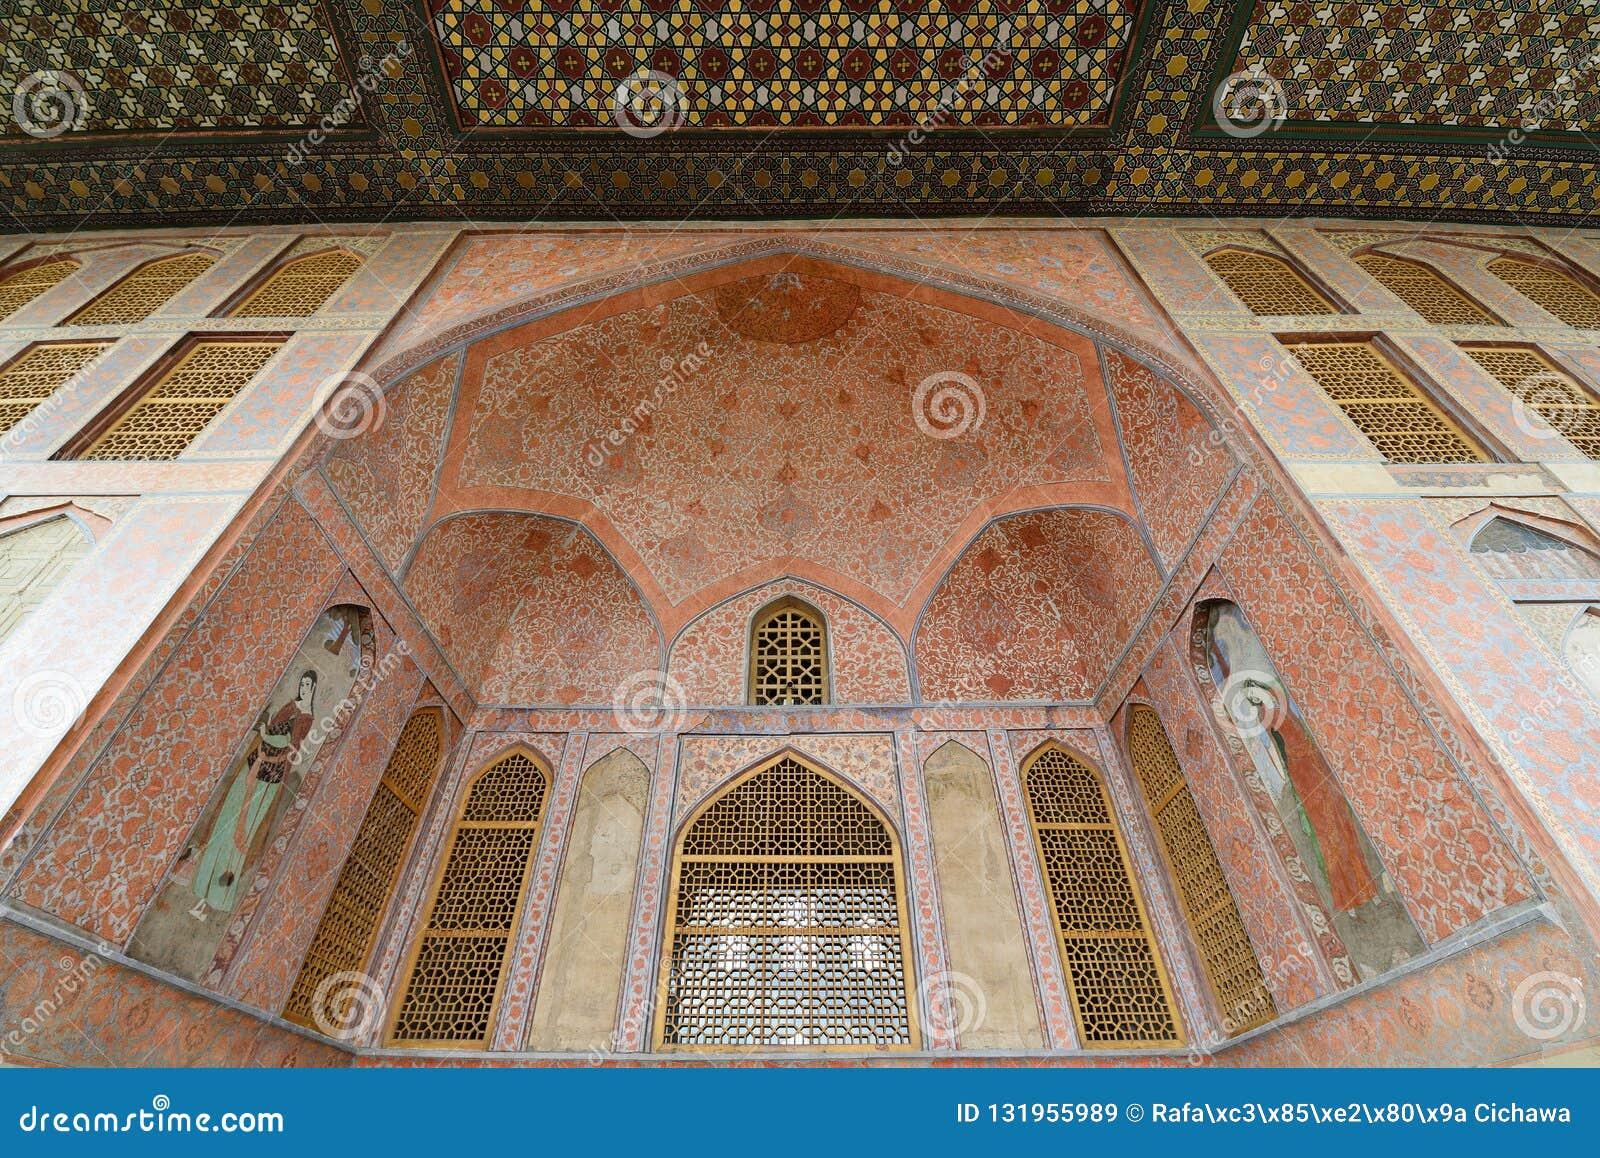 Isfahan Ancient Islamic City In Iran Stock Image - Image of